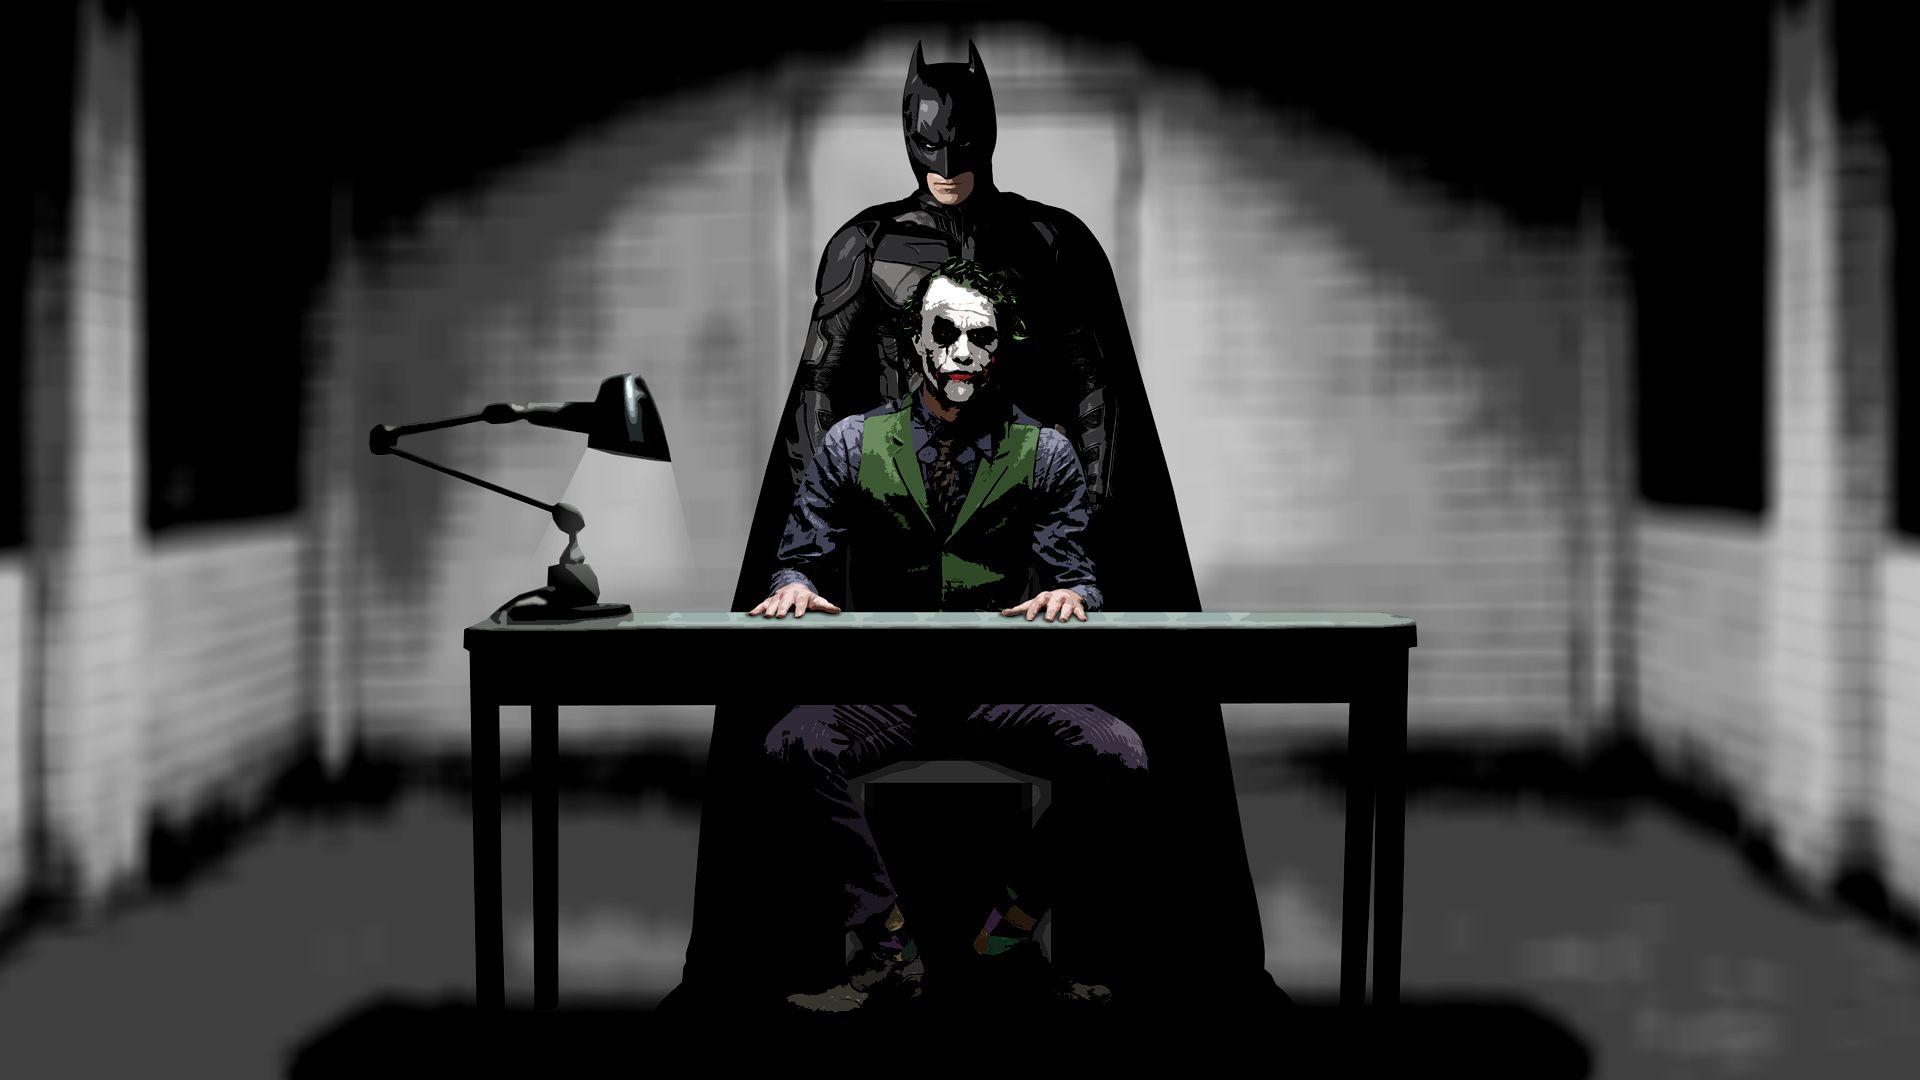 Joker Interrogation Batman Joker Wallpaper Joker Wallpapers Batman Wallpaper